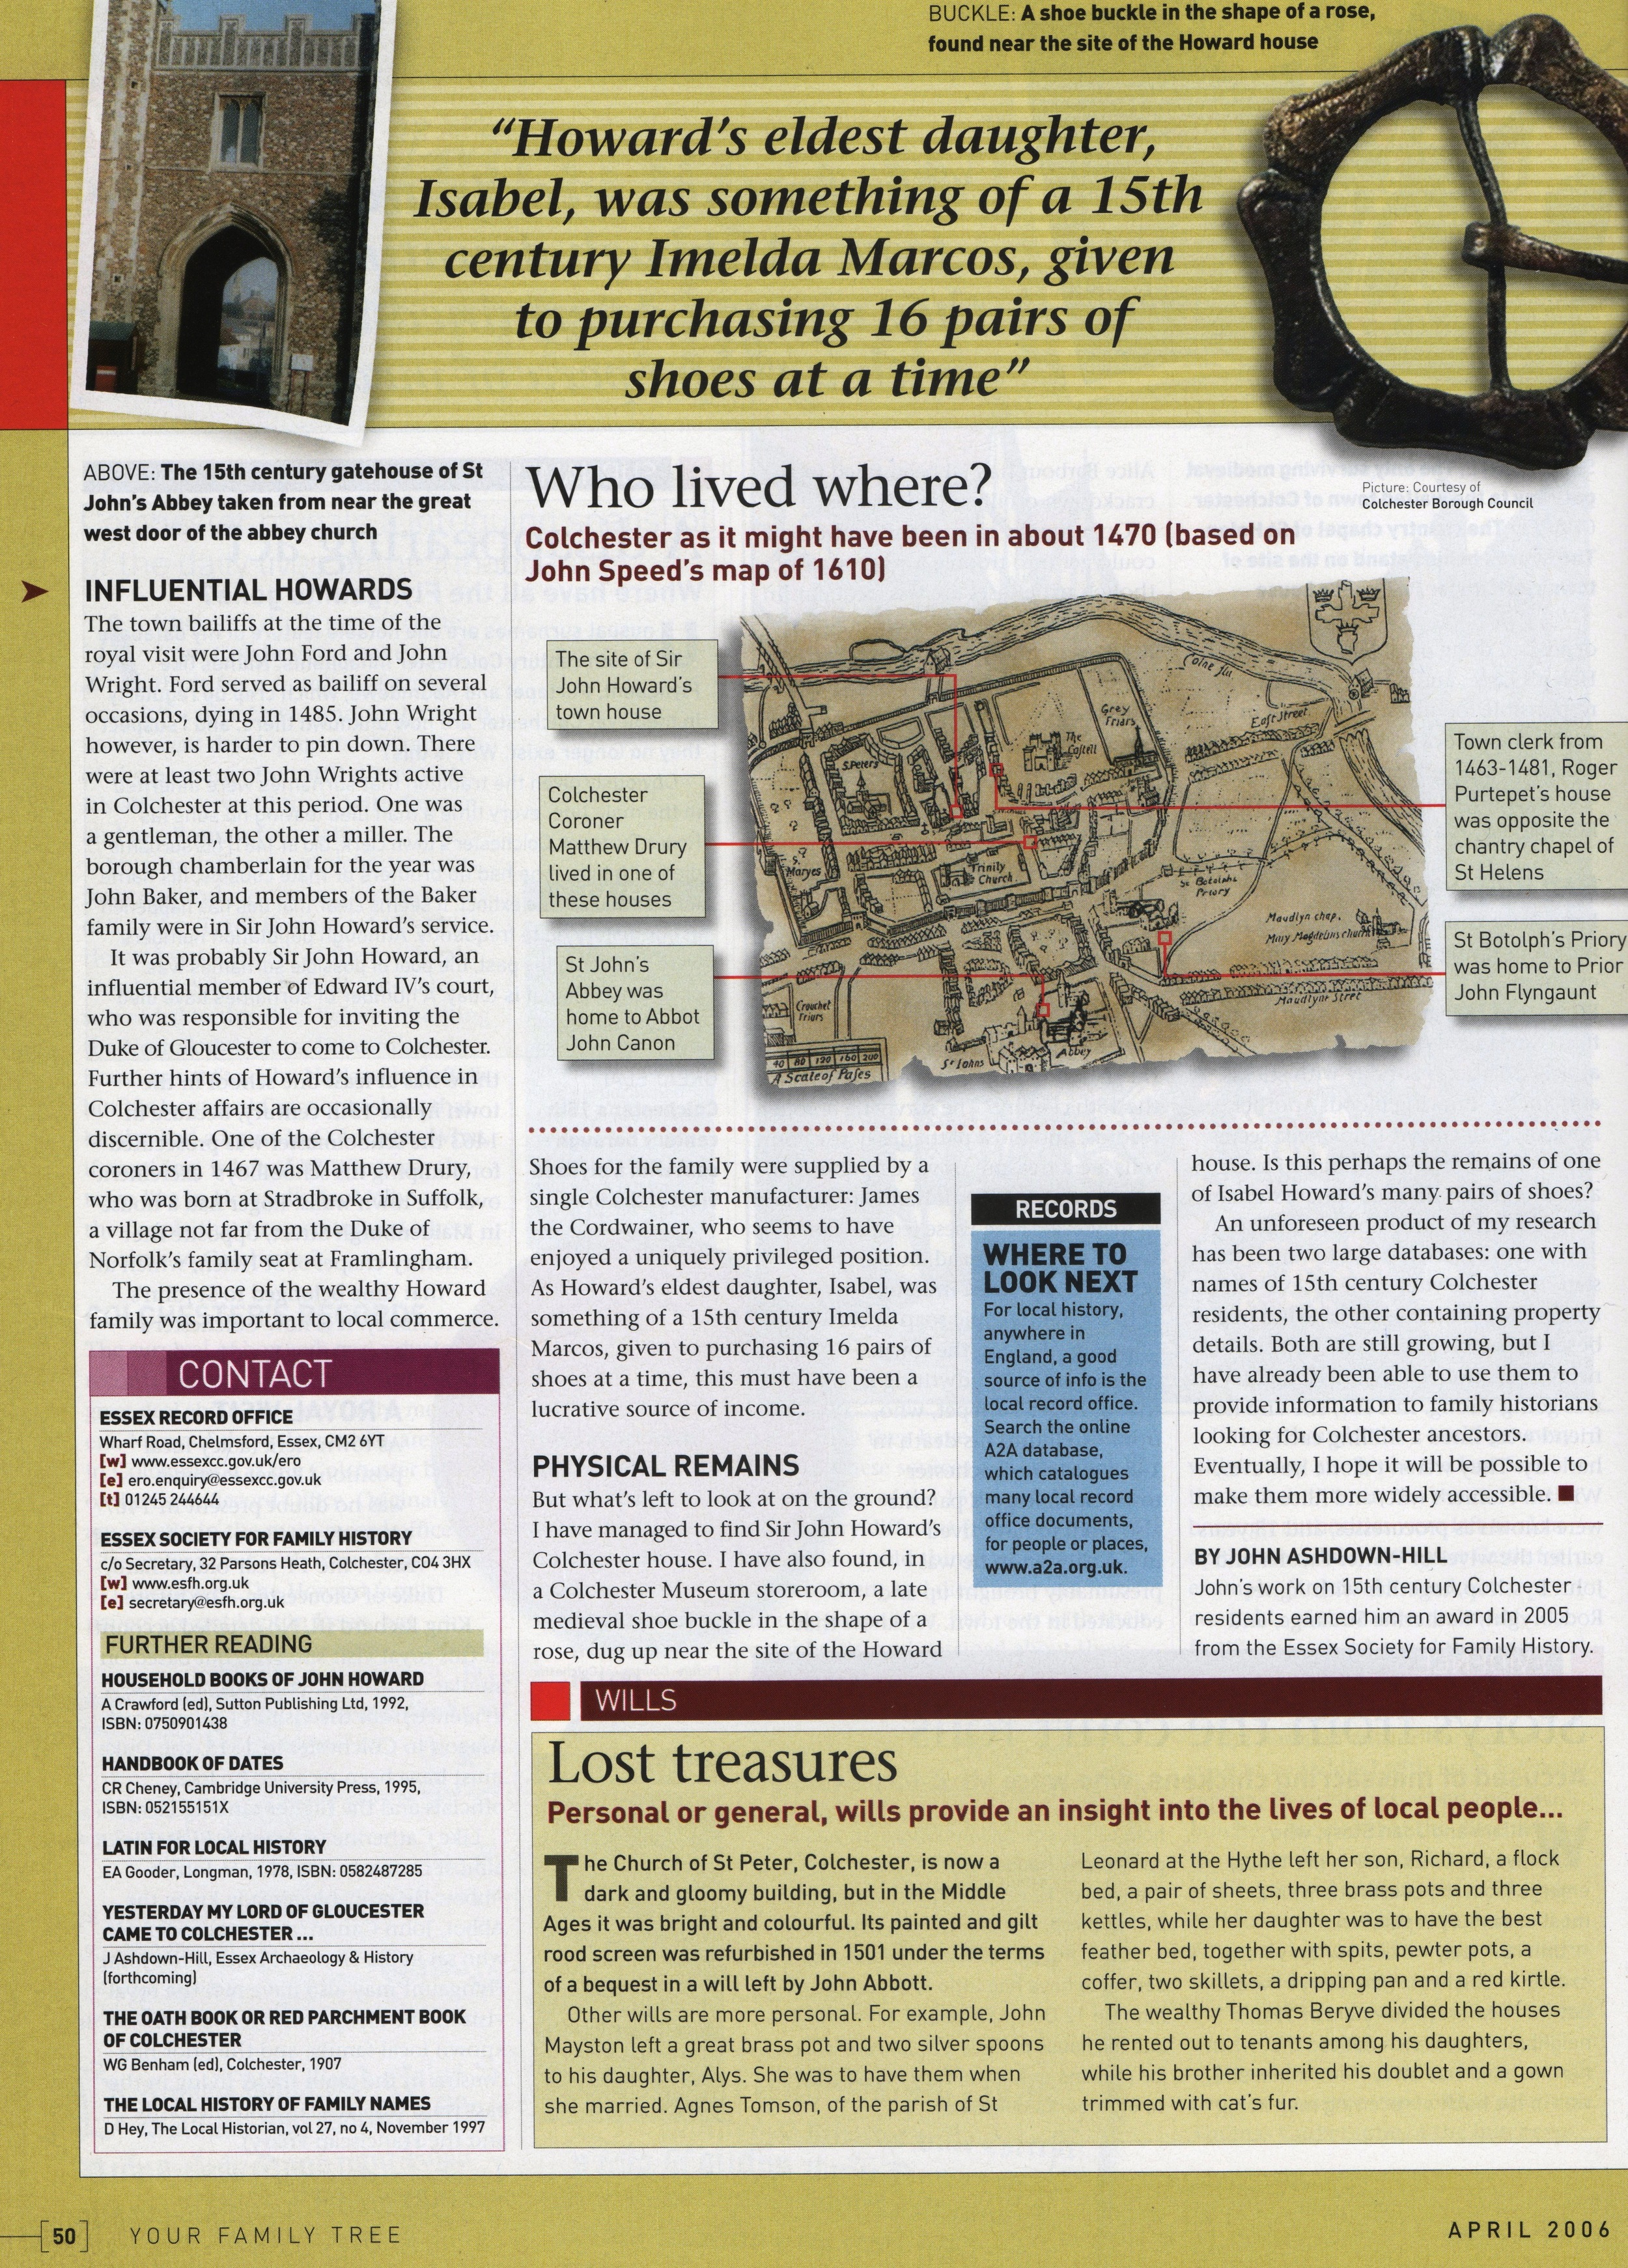 Your Family Tree magazine, April 2006c.jpg